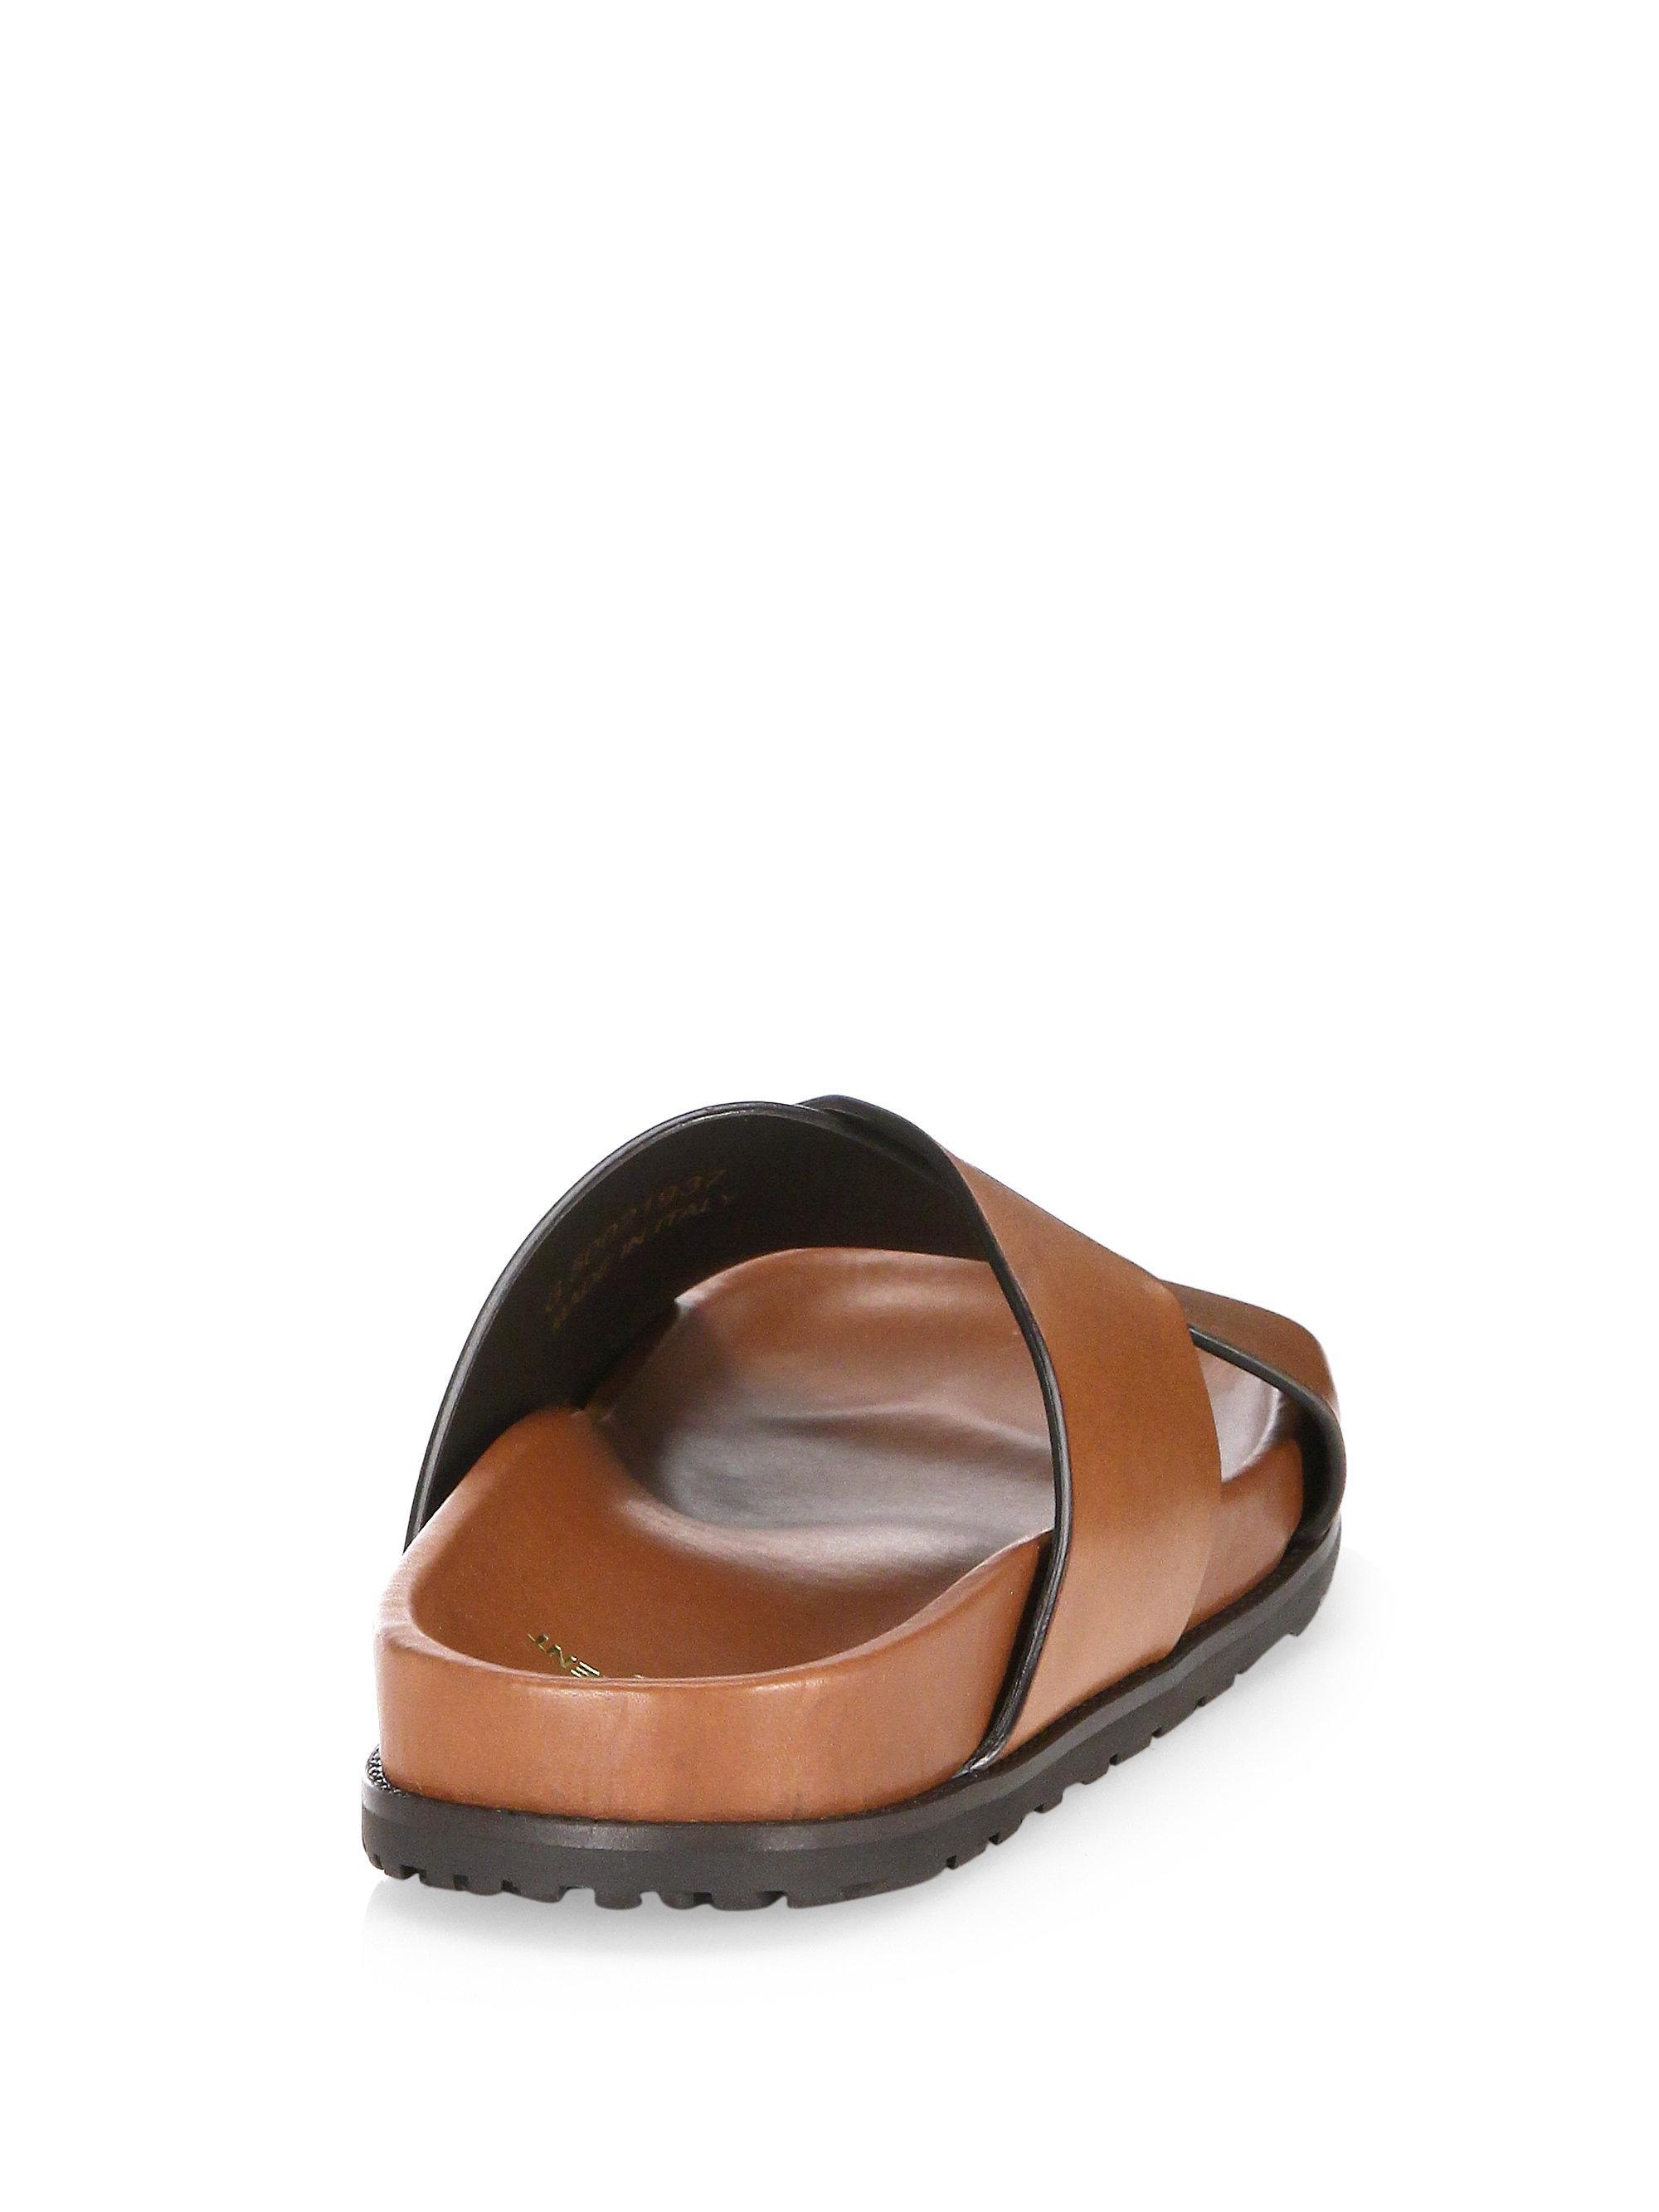 Saint Laurent Jimmy Crisscross Leather Flat Sandals IbVDQFg